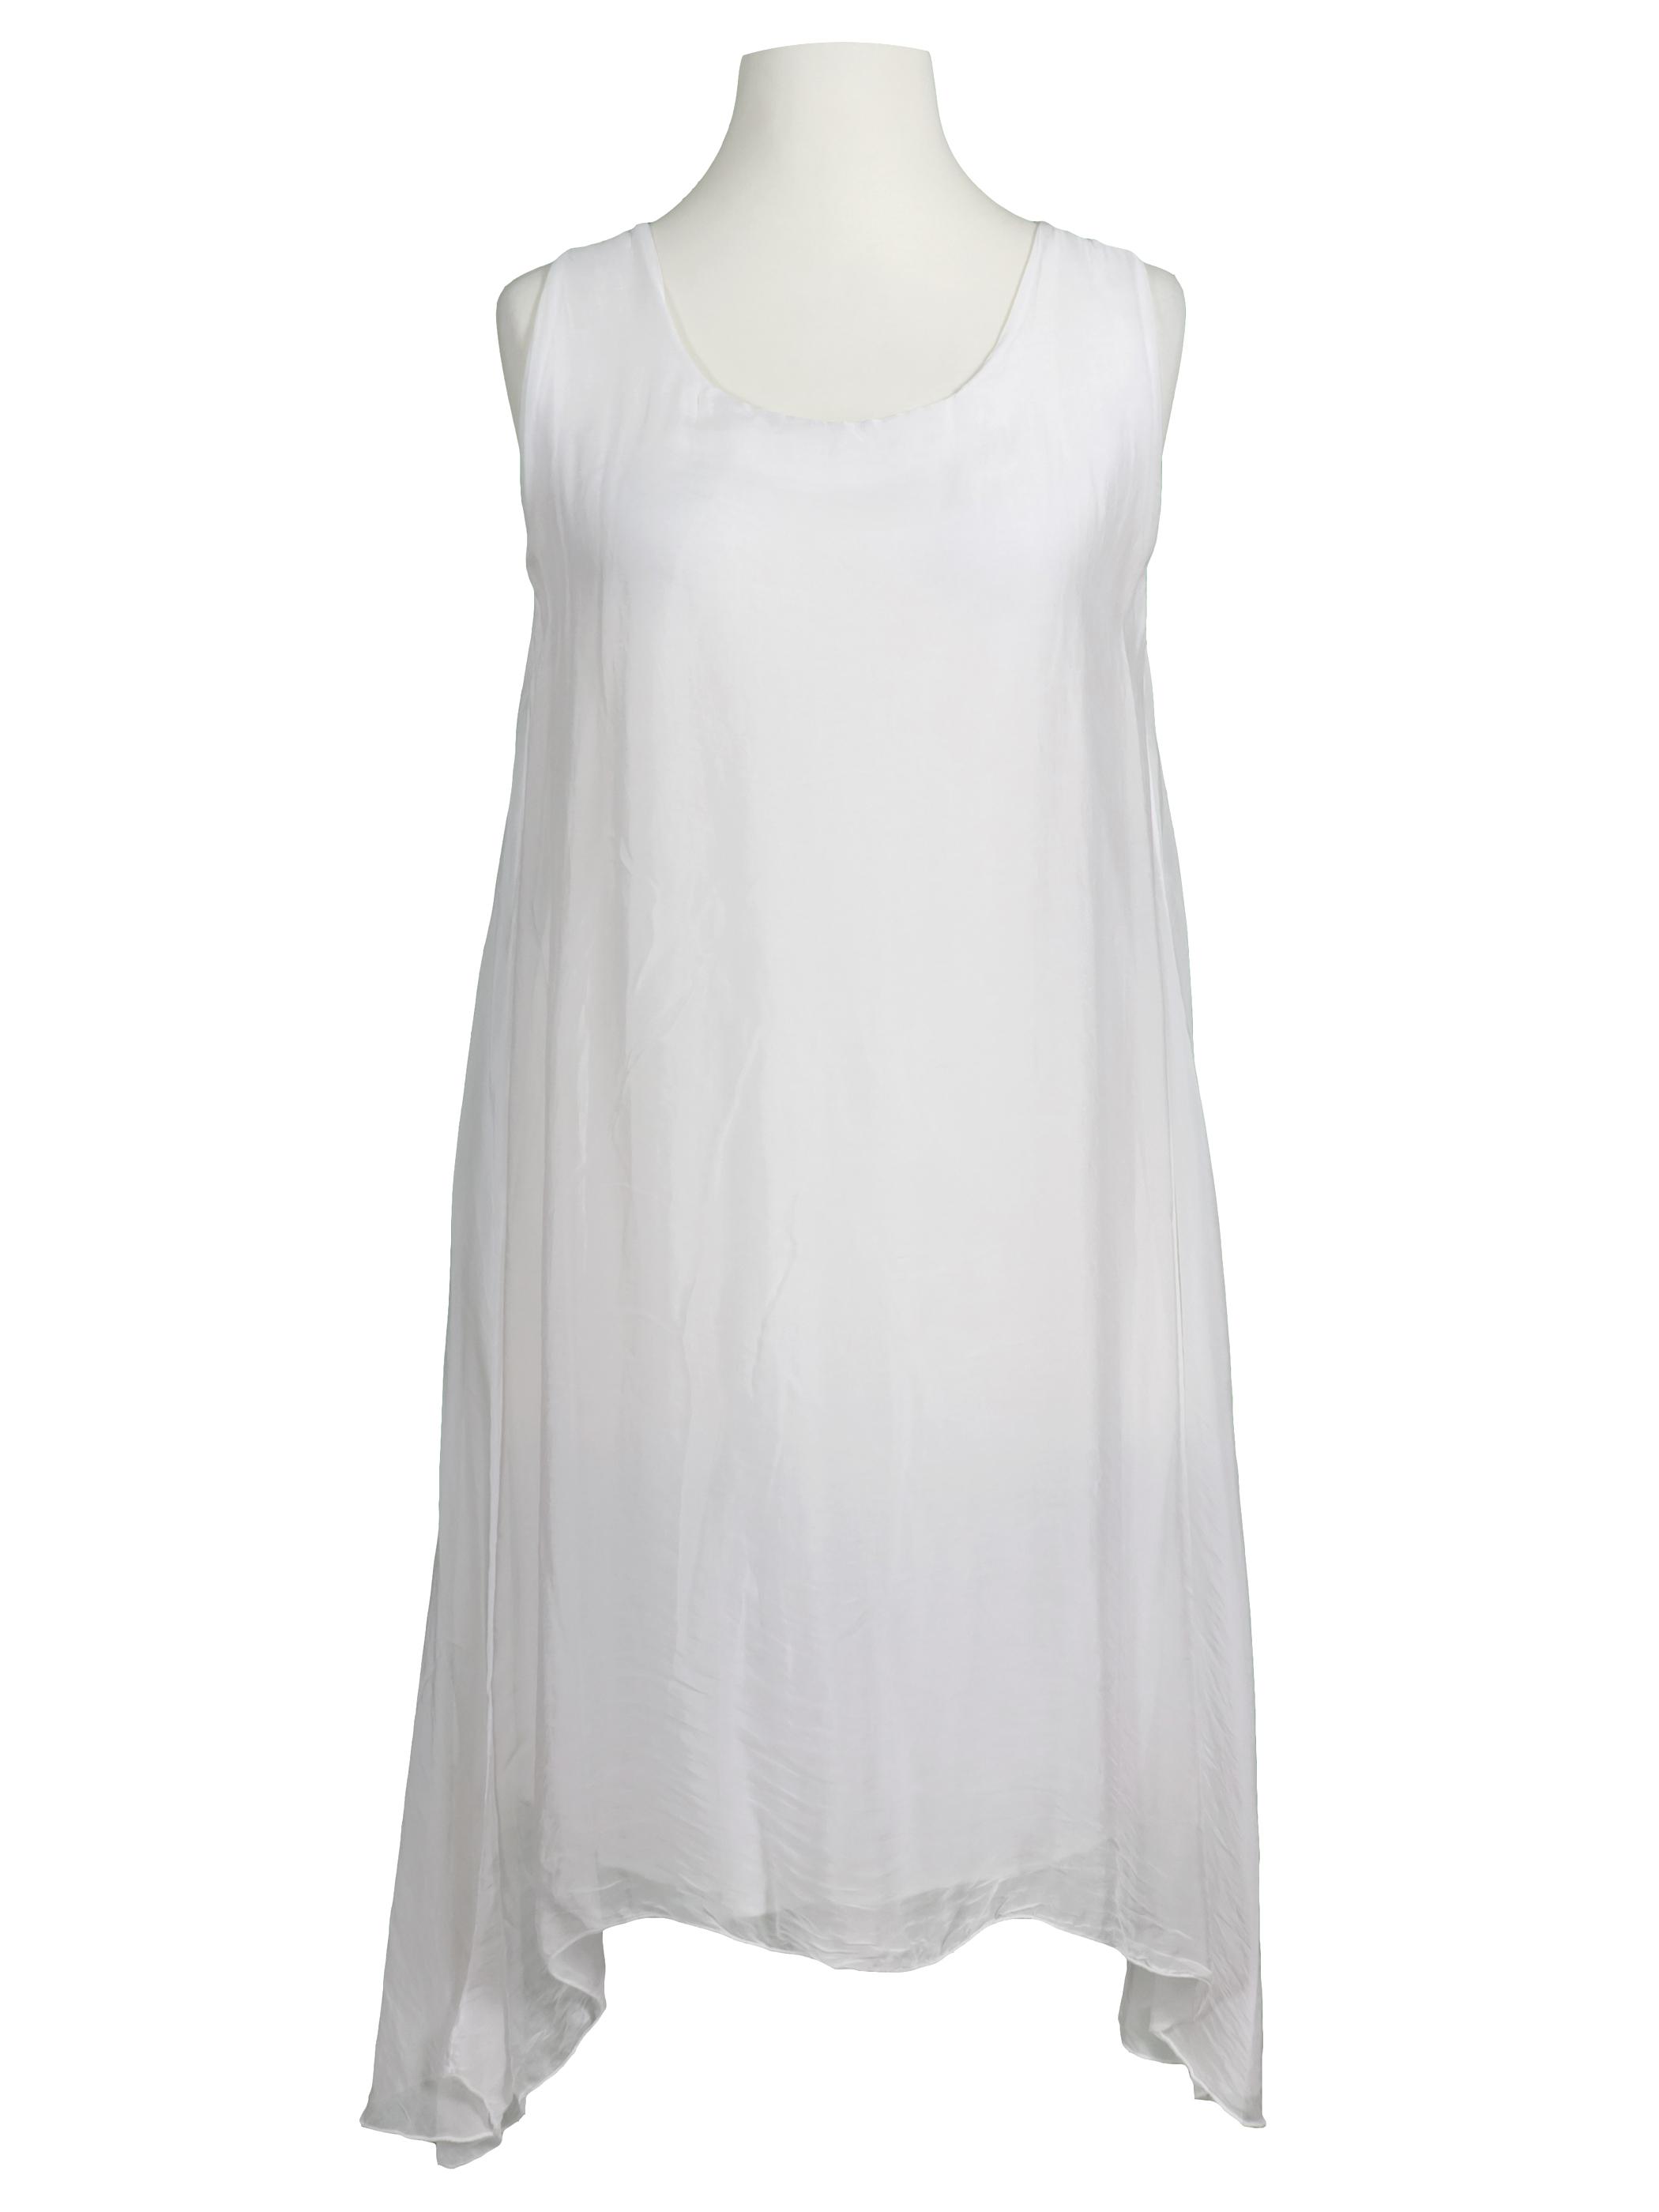 on sale ff5d5 c0fcf Kleid mit Seide A-Form, weiss